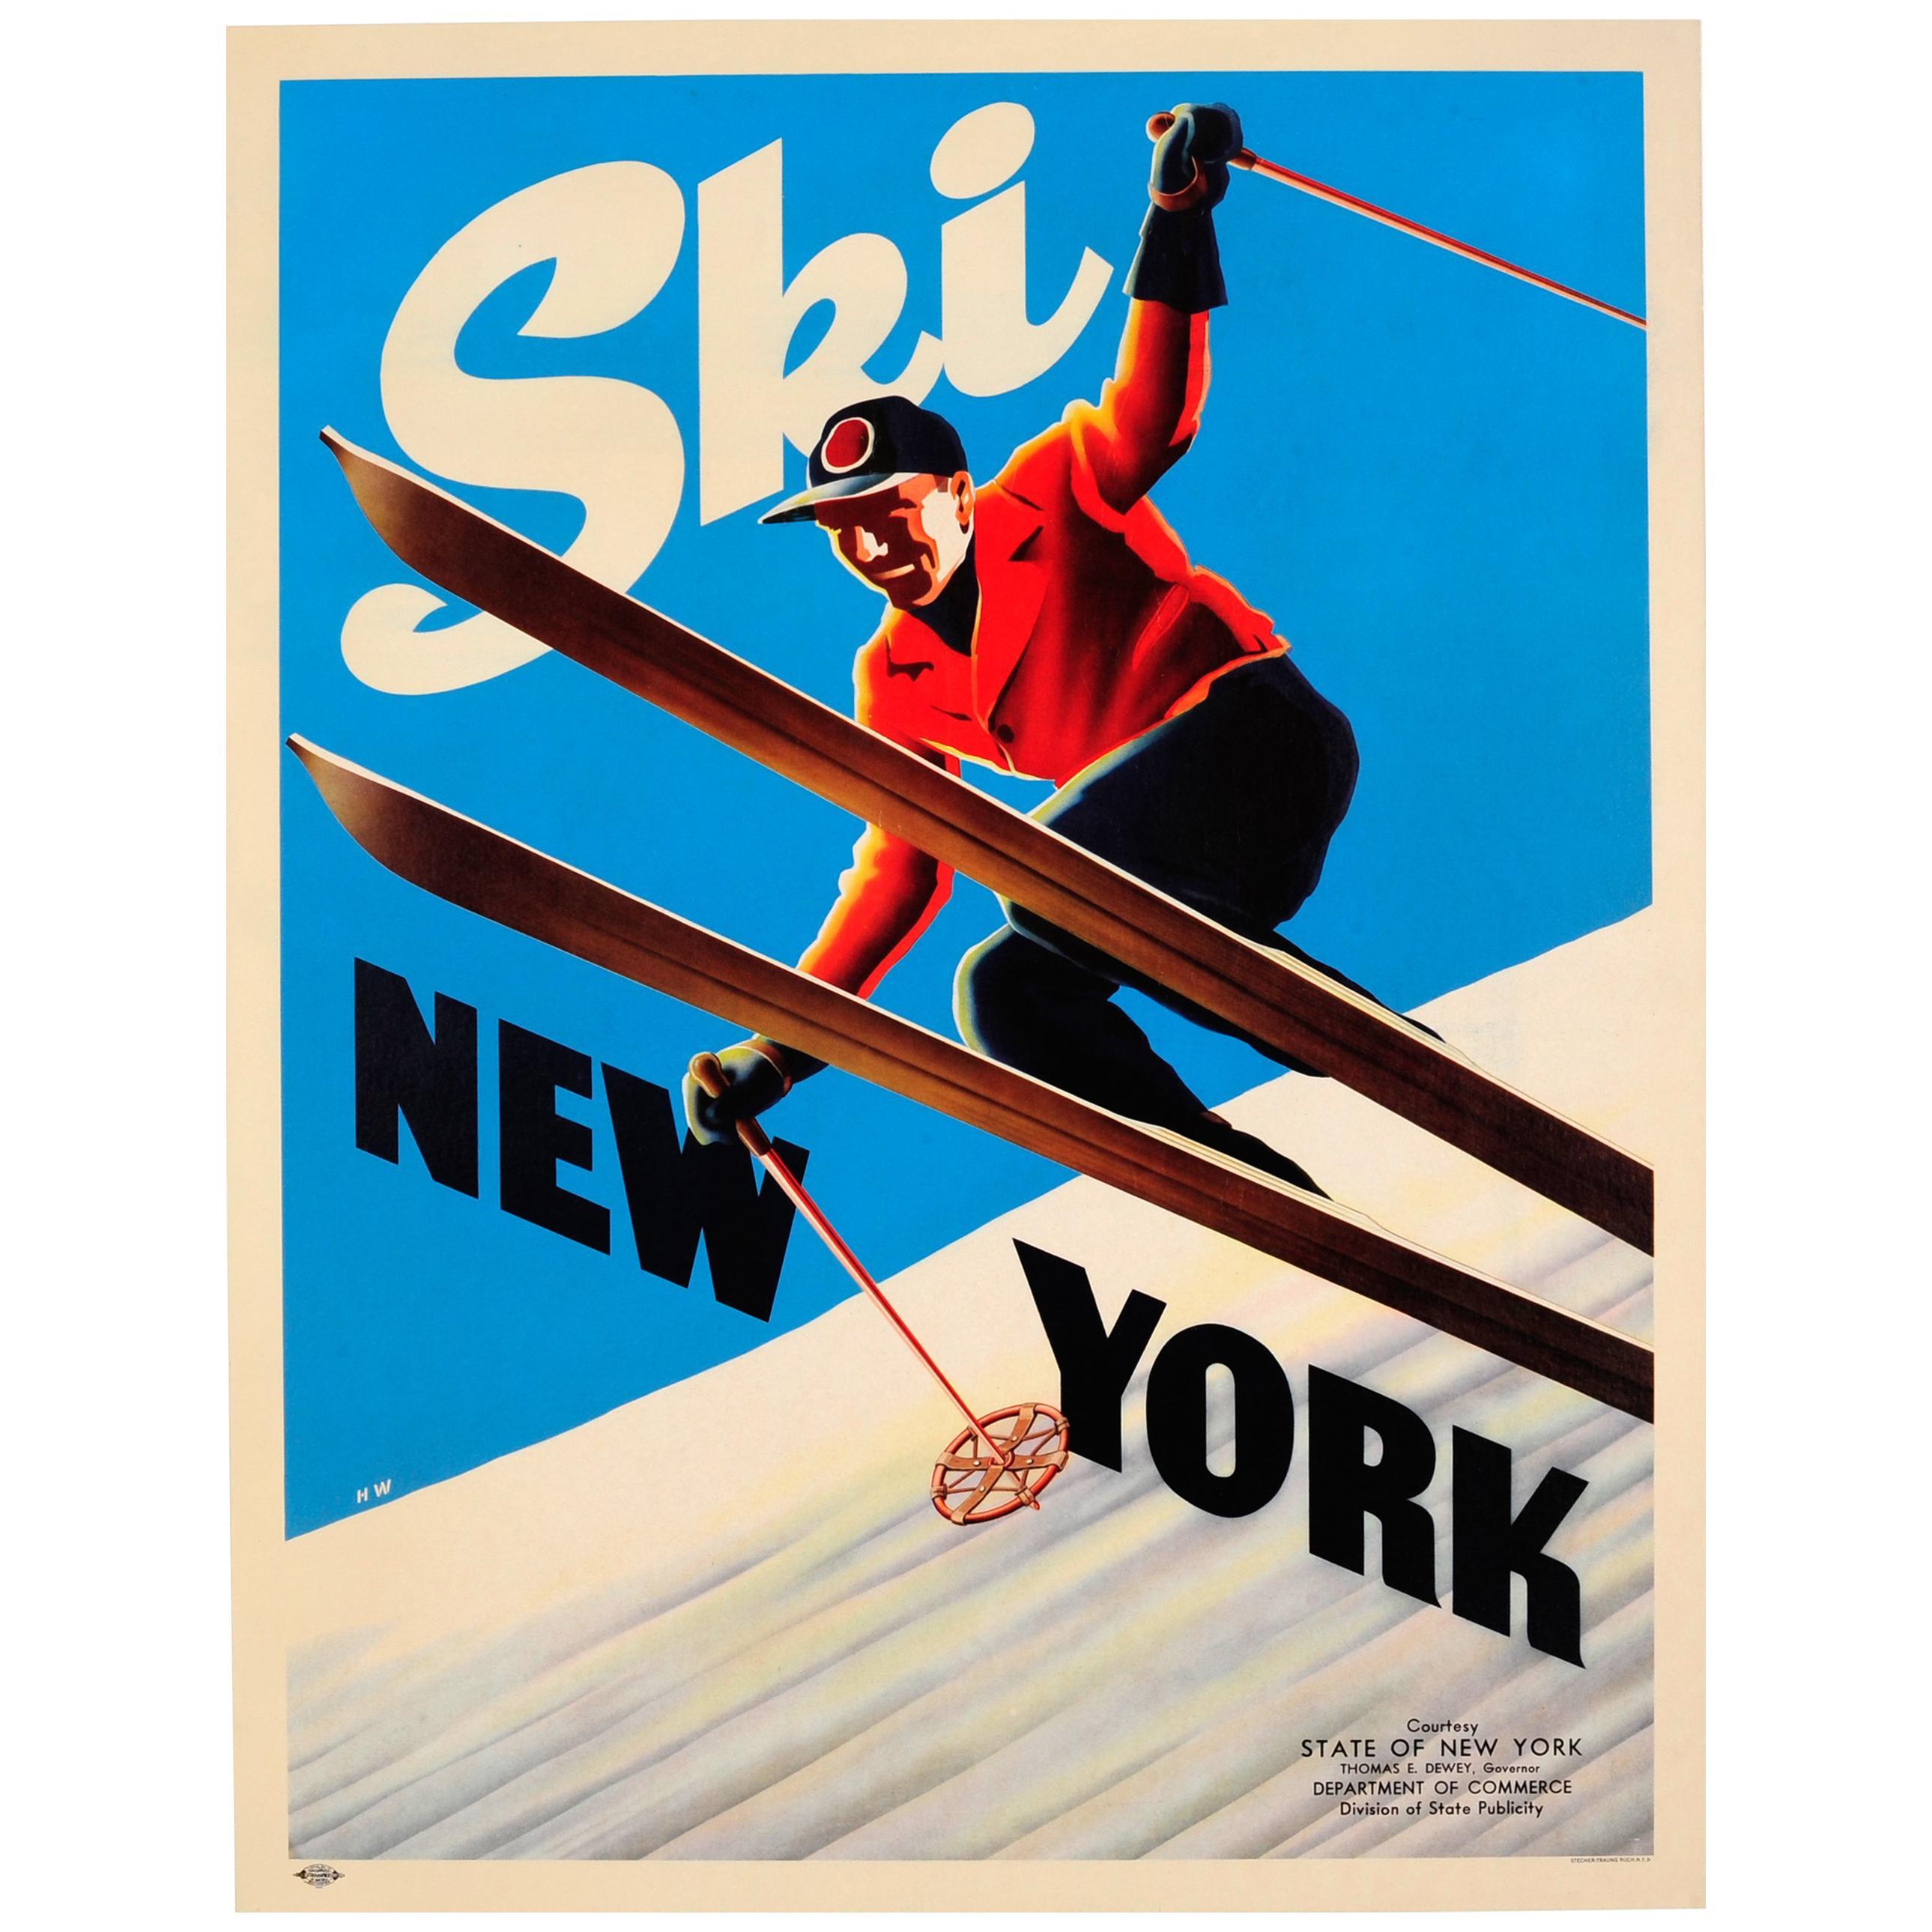 Original Vintage Skiing Poster Ski New York Ft. Skier Courtesy NY State Governor